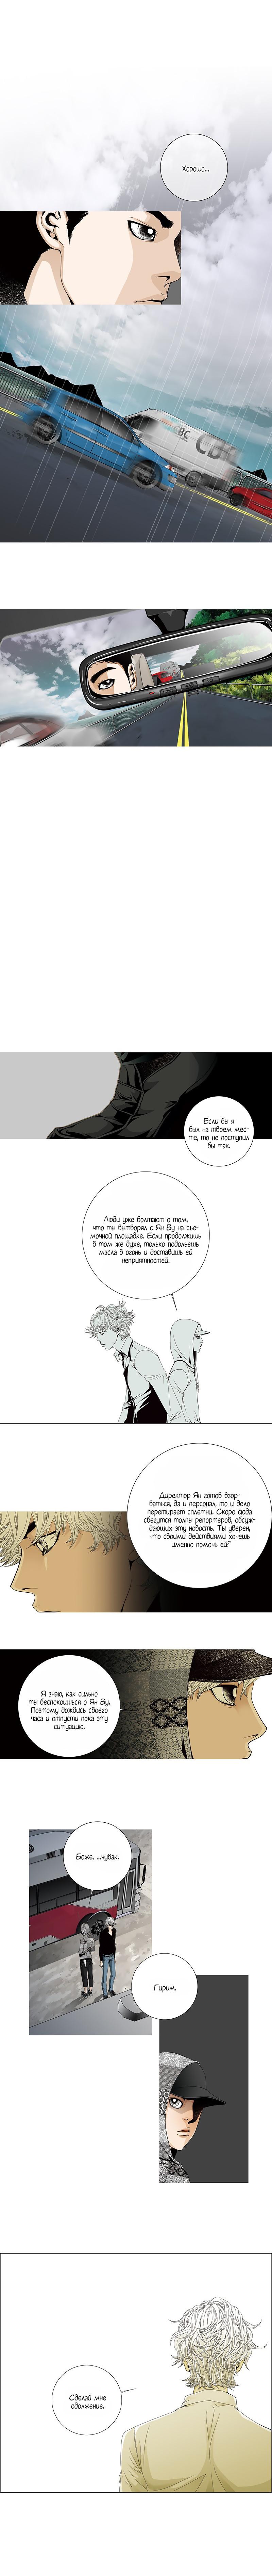 https://r1.ninemanga.com/comics/pic2/29/28573/344342/1512078859218.jpg Page 2